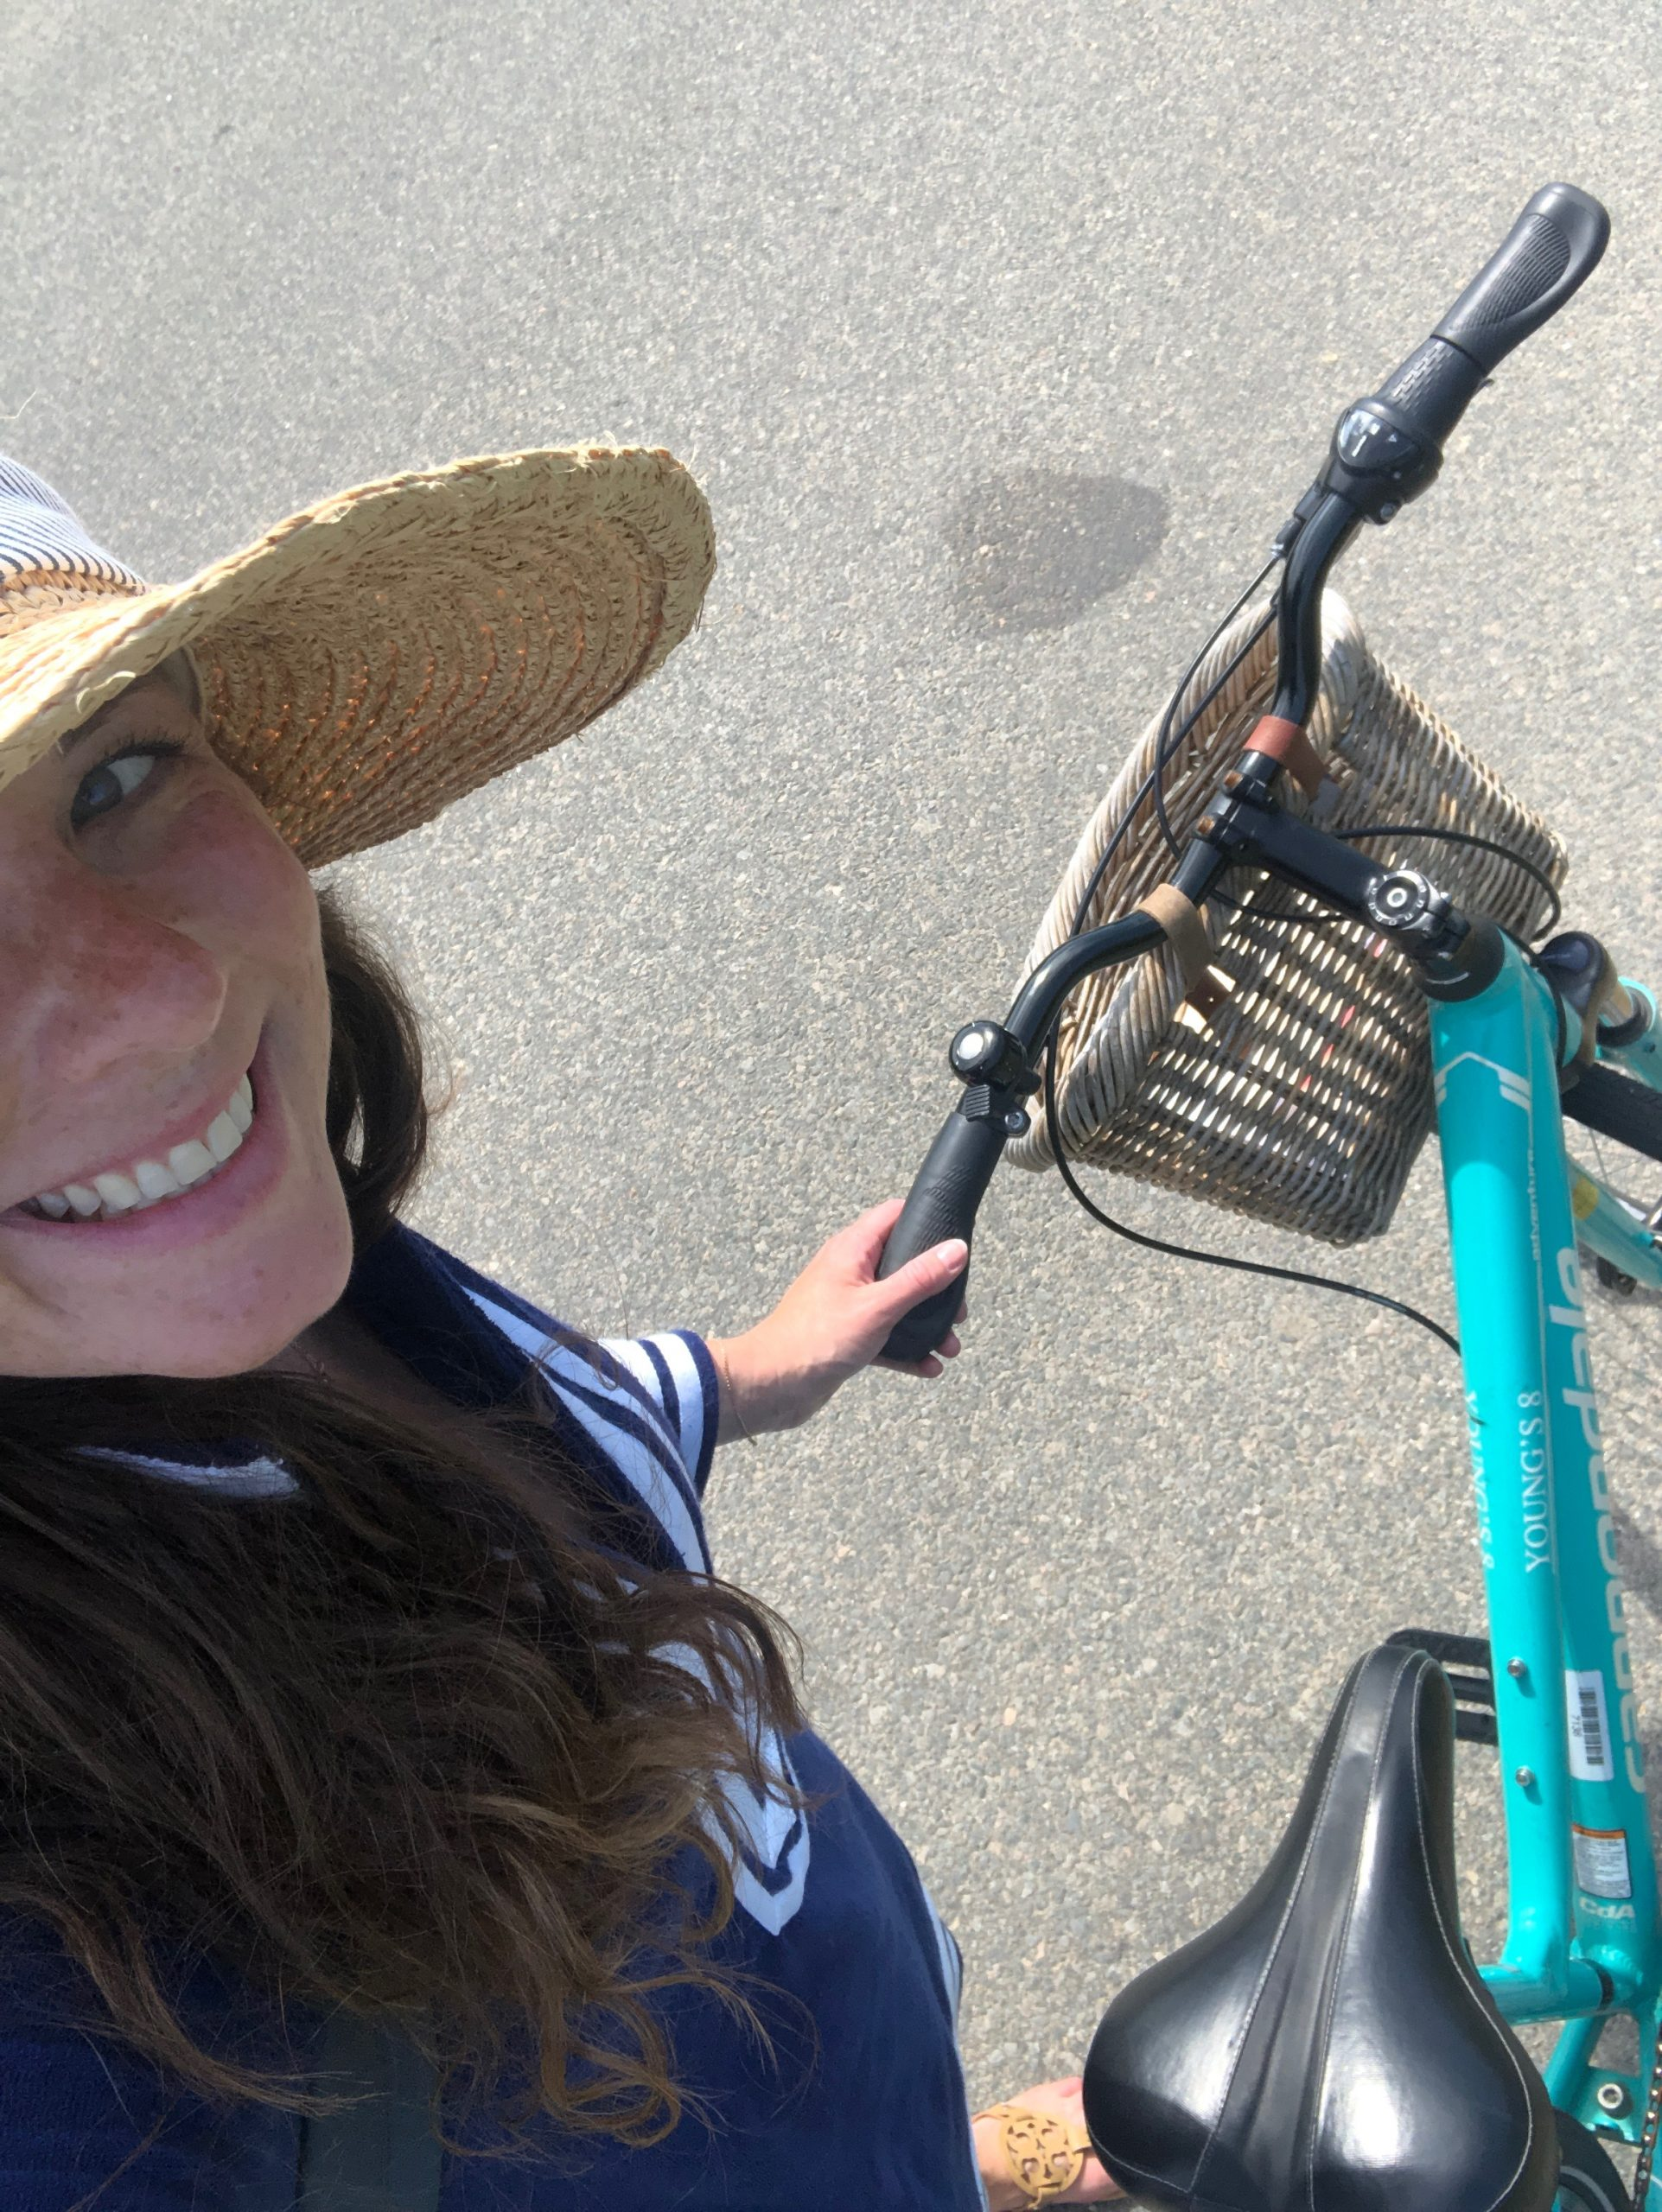 woman riding turquoise bike in nantucket